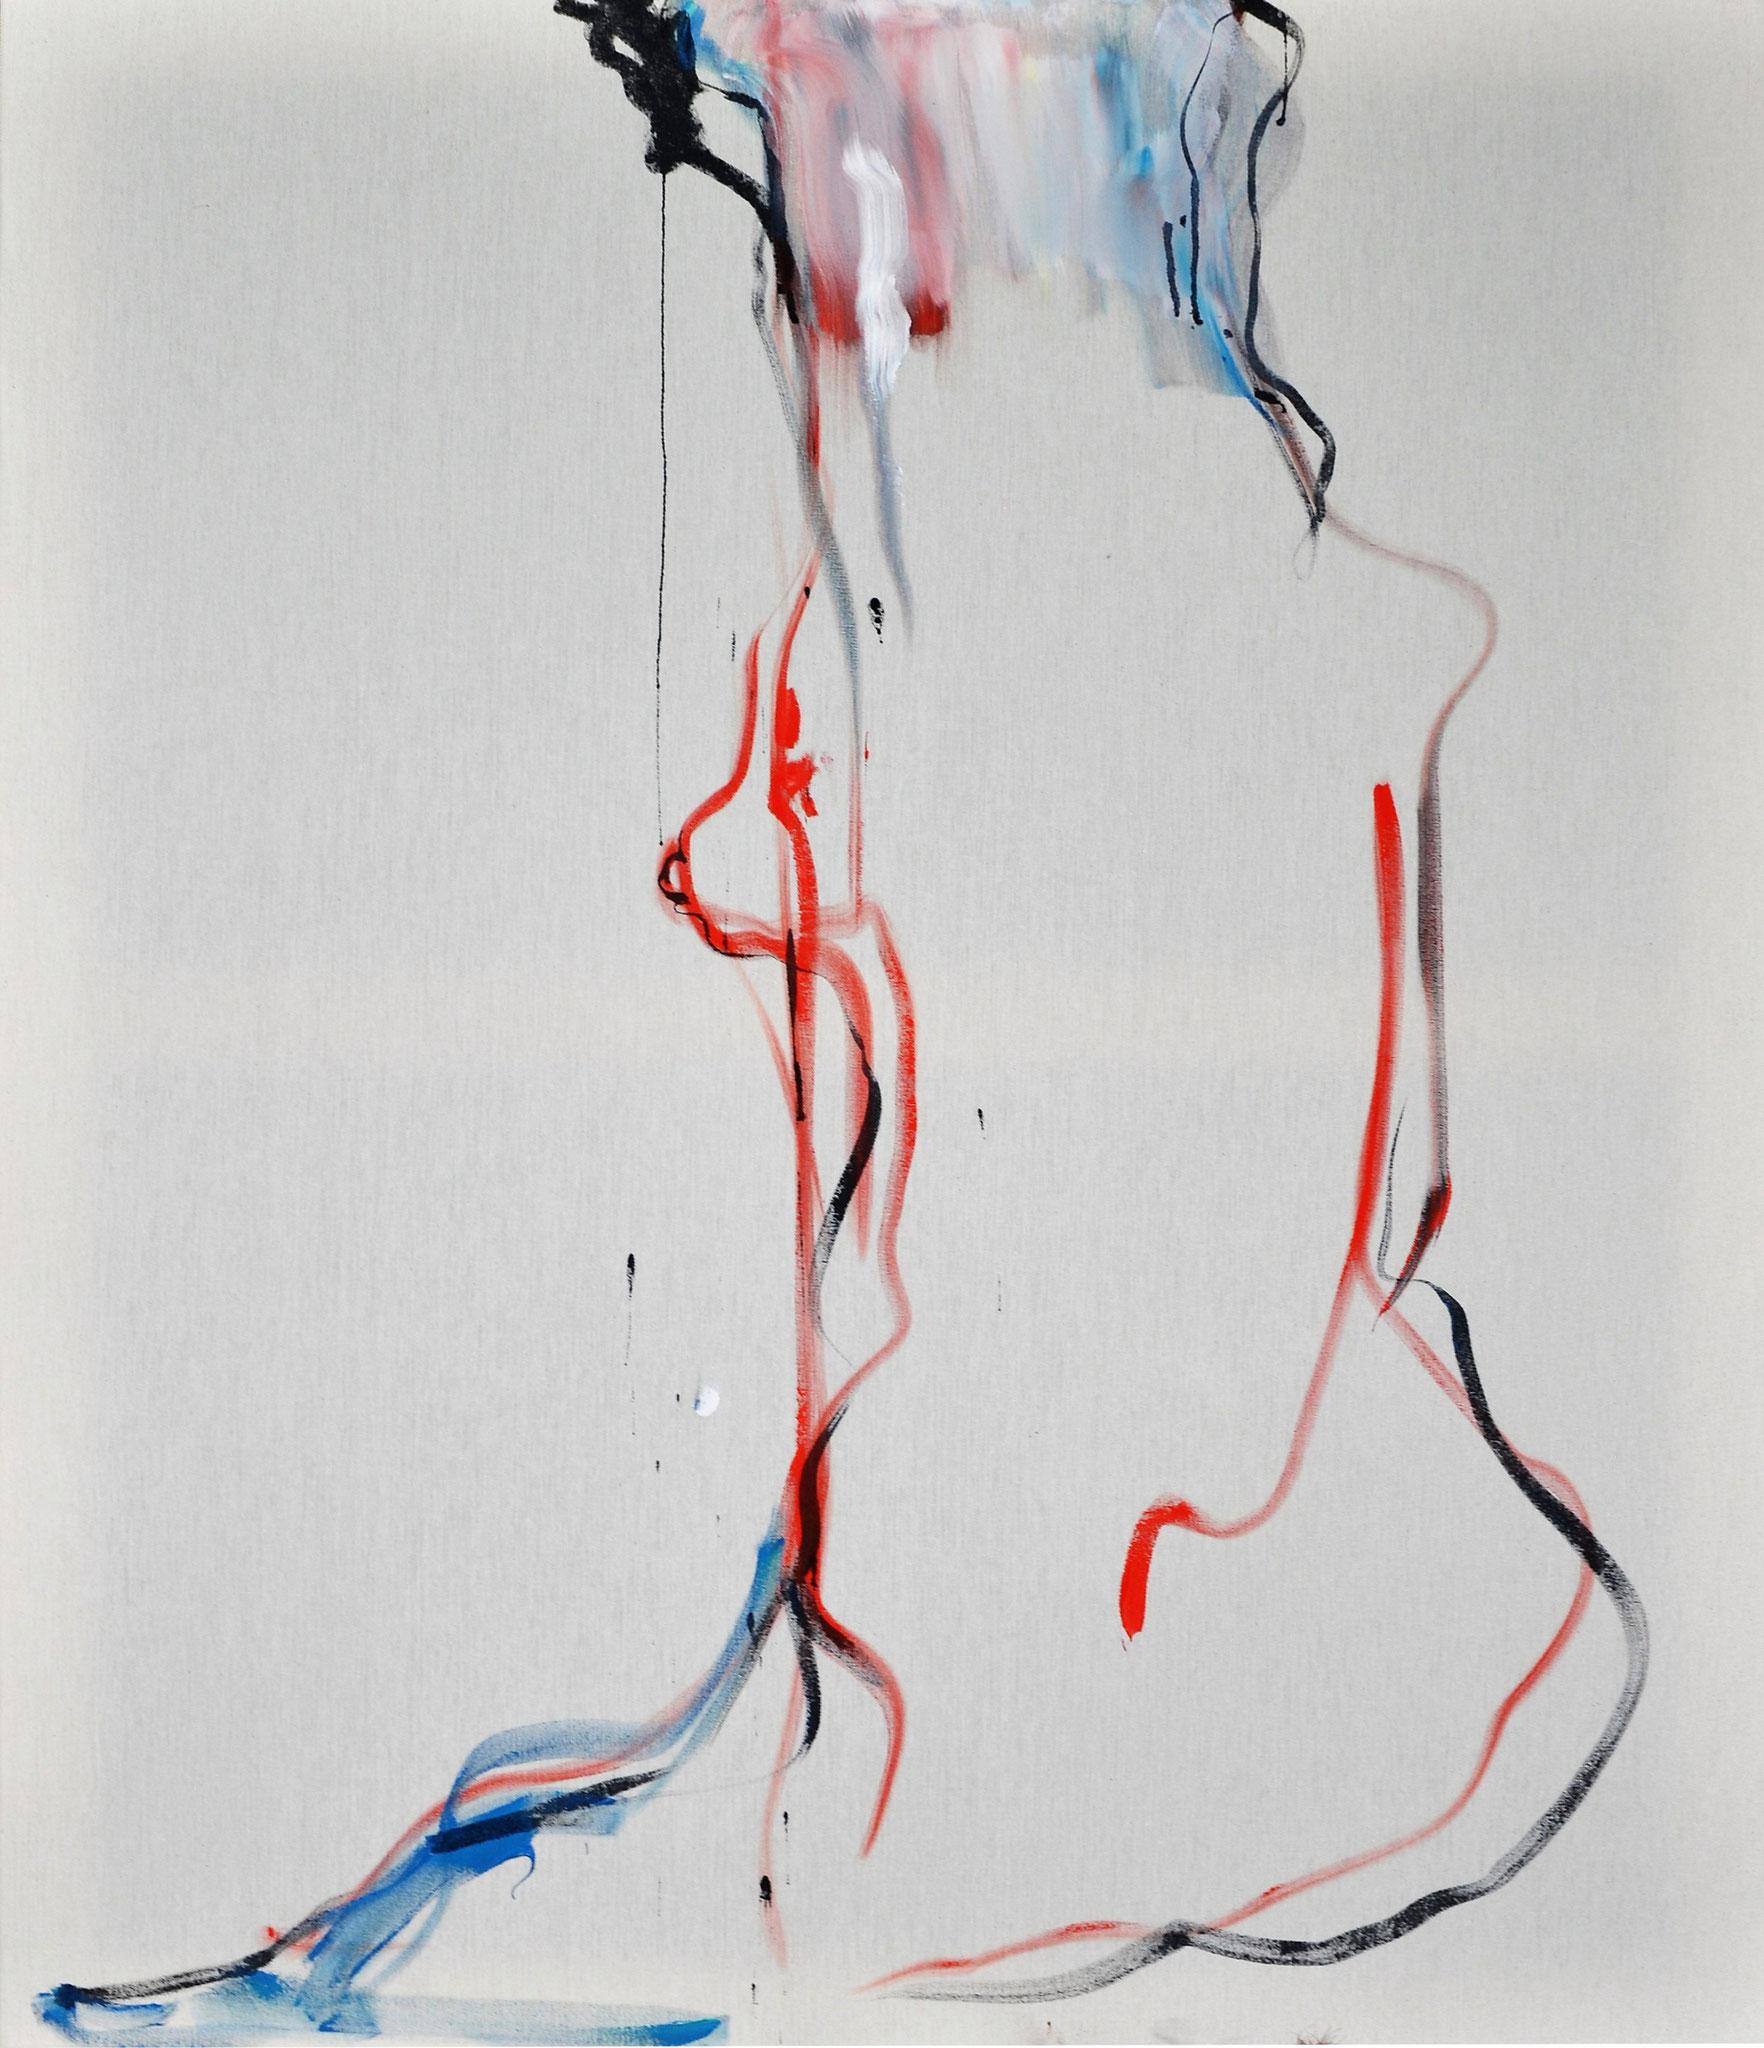 In dictum I (Acrylic on Canvas, 120x100cm)